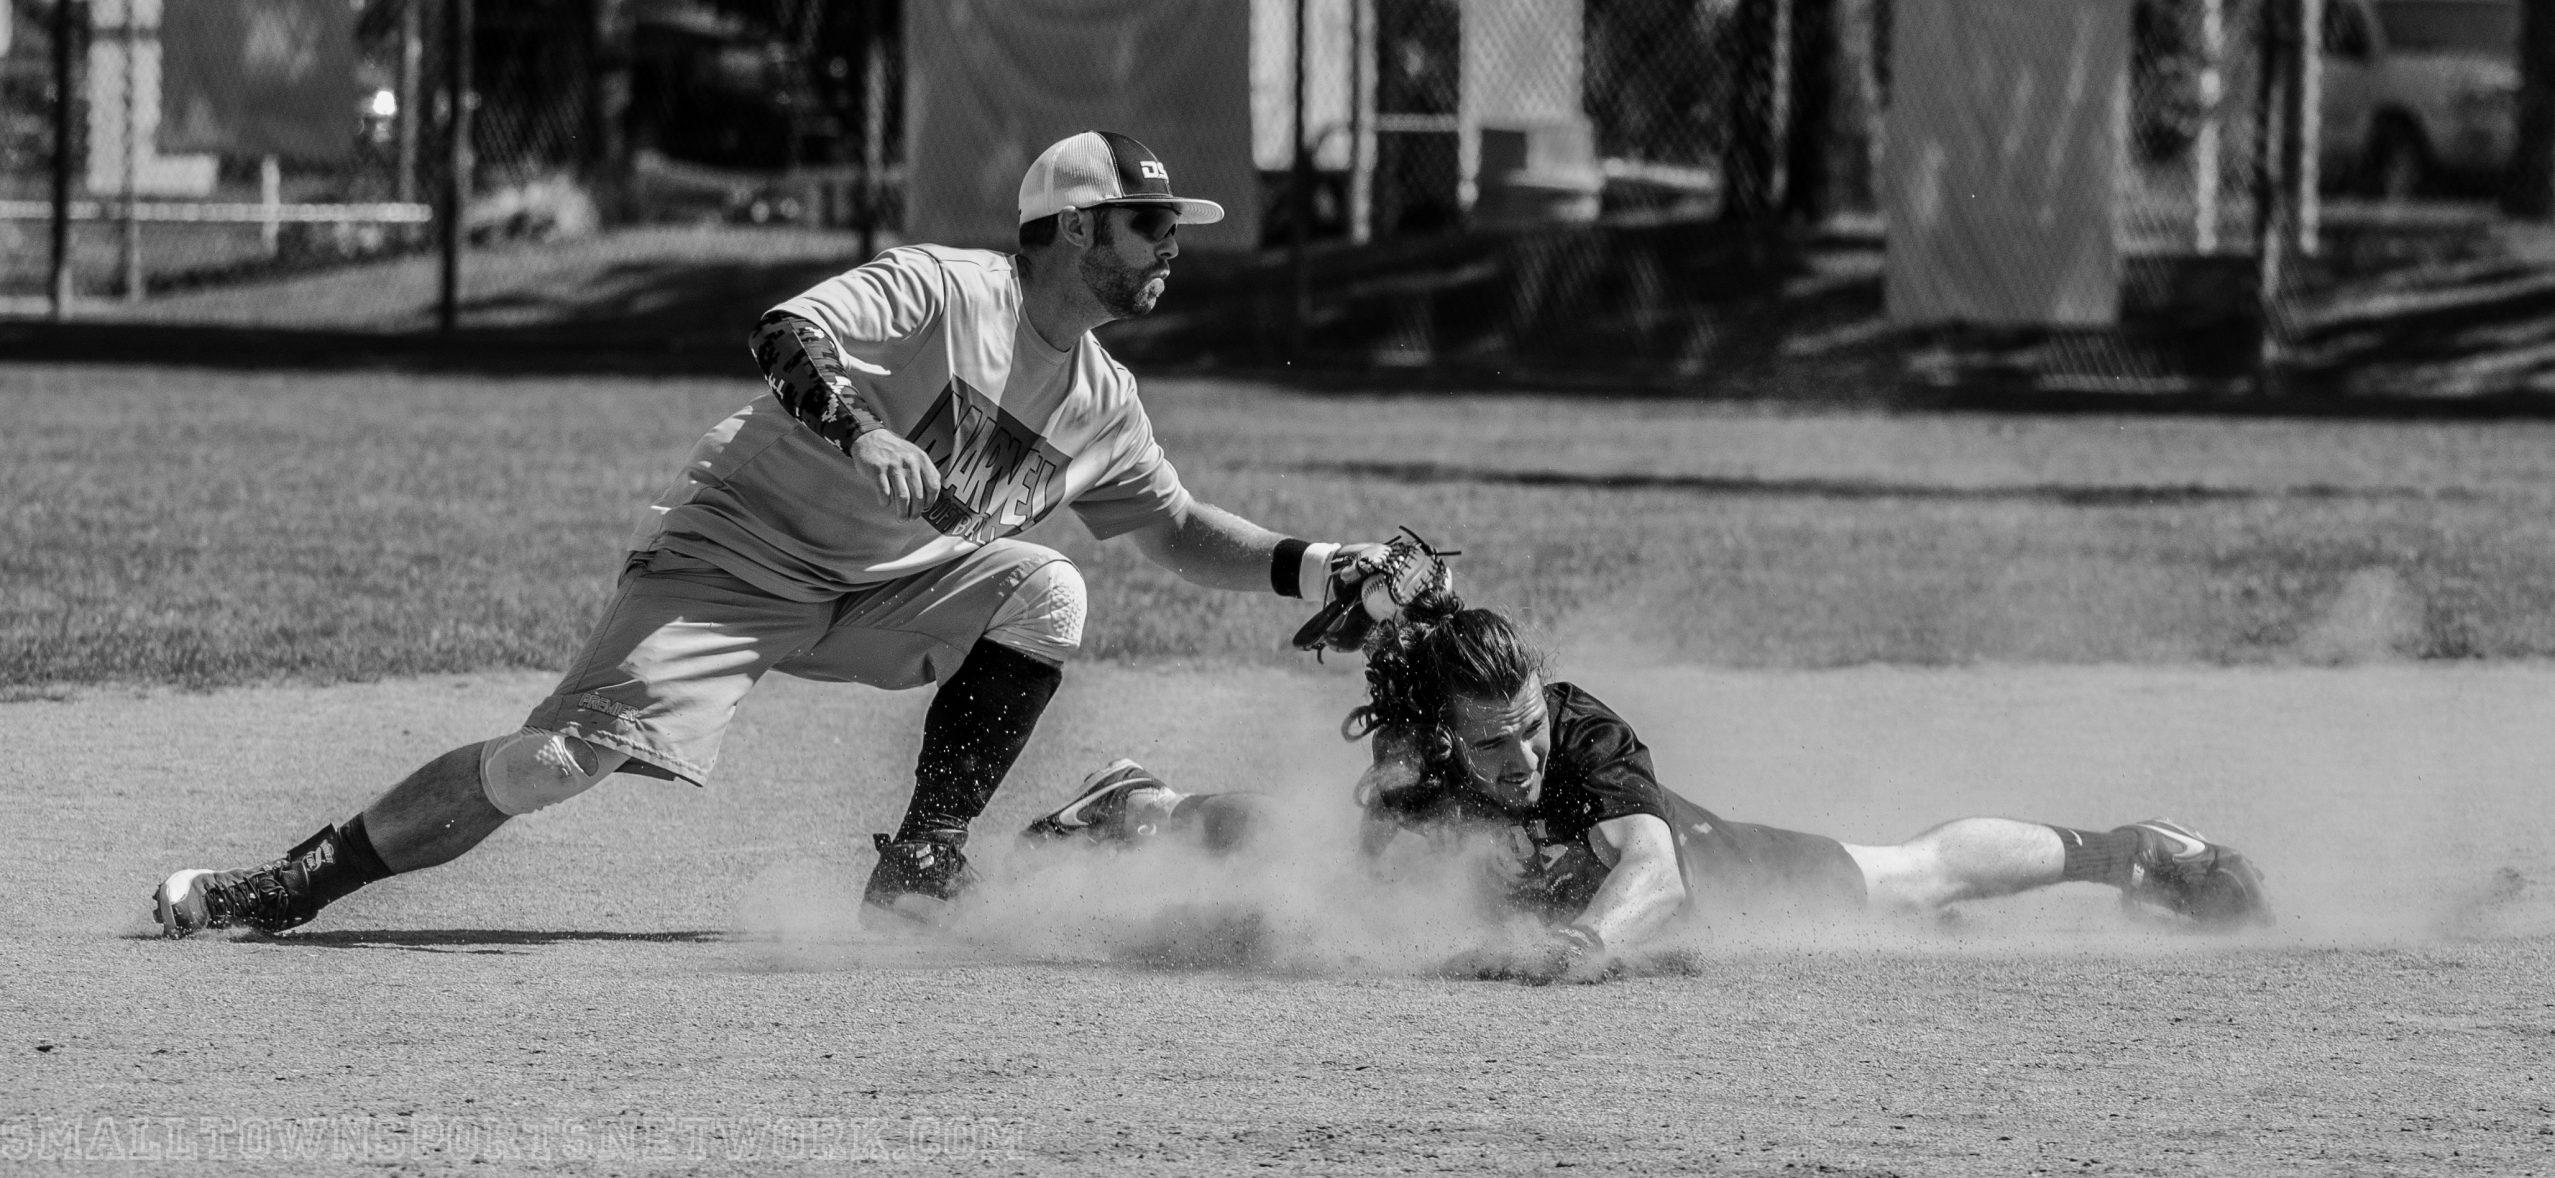 sports photography blog post photo